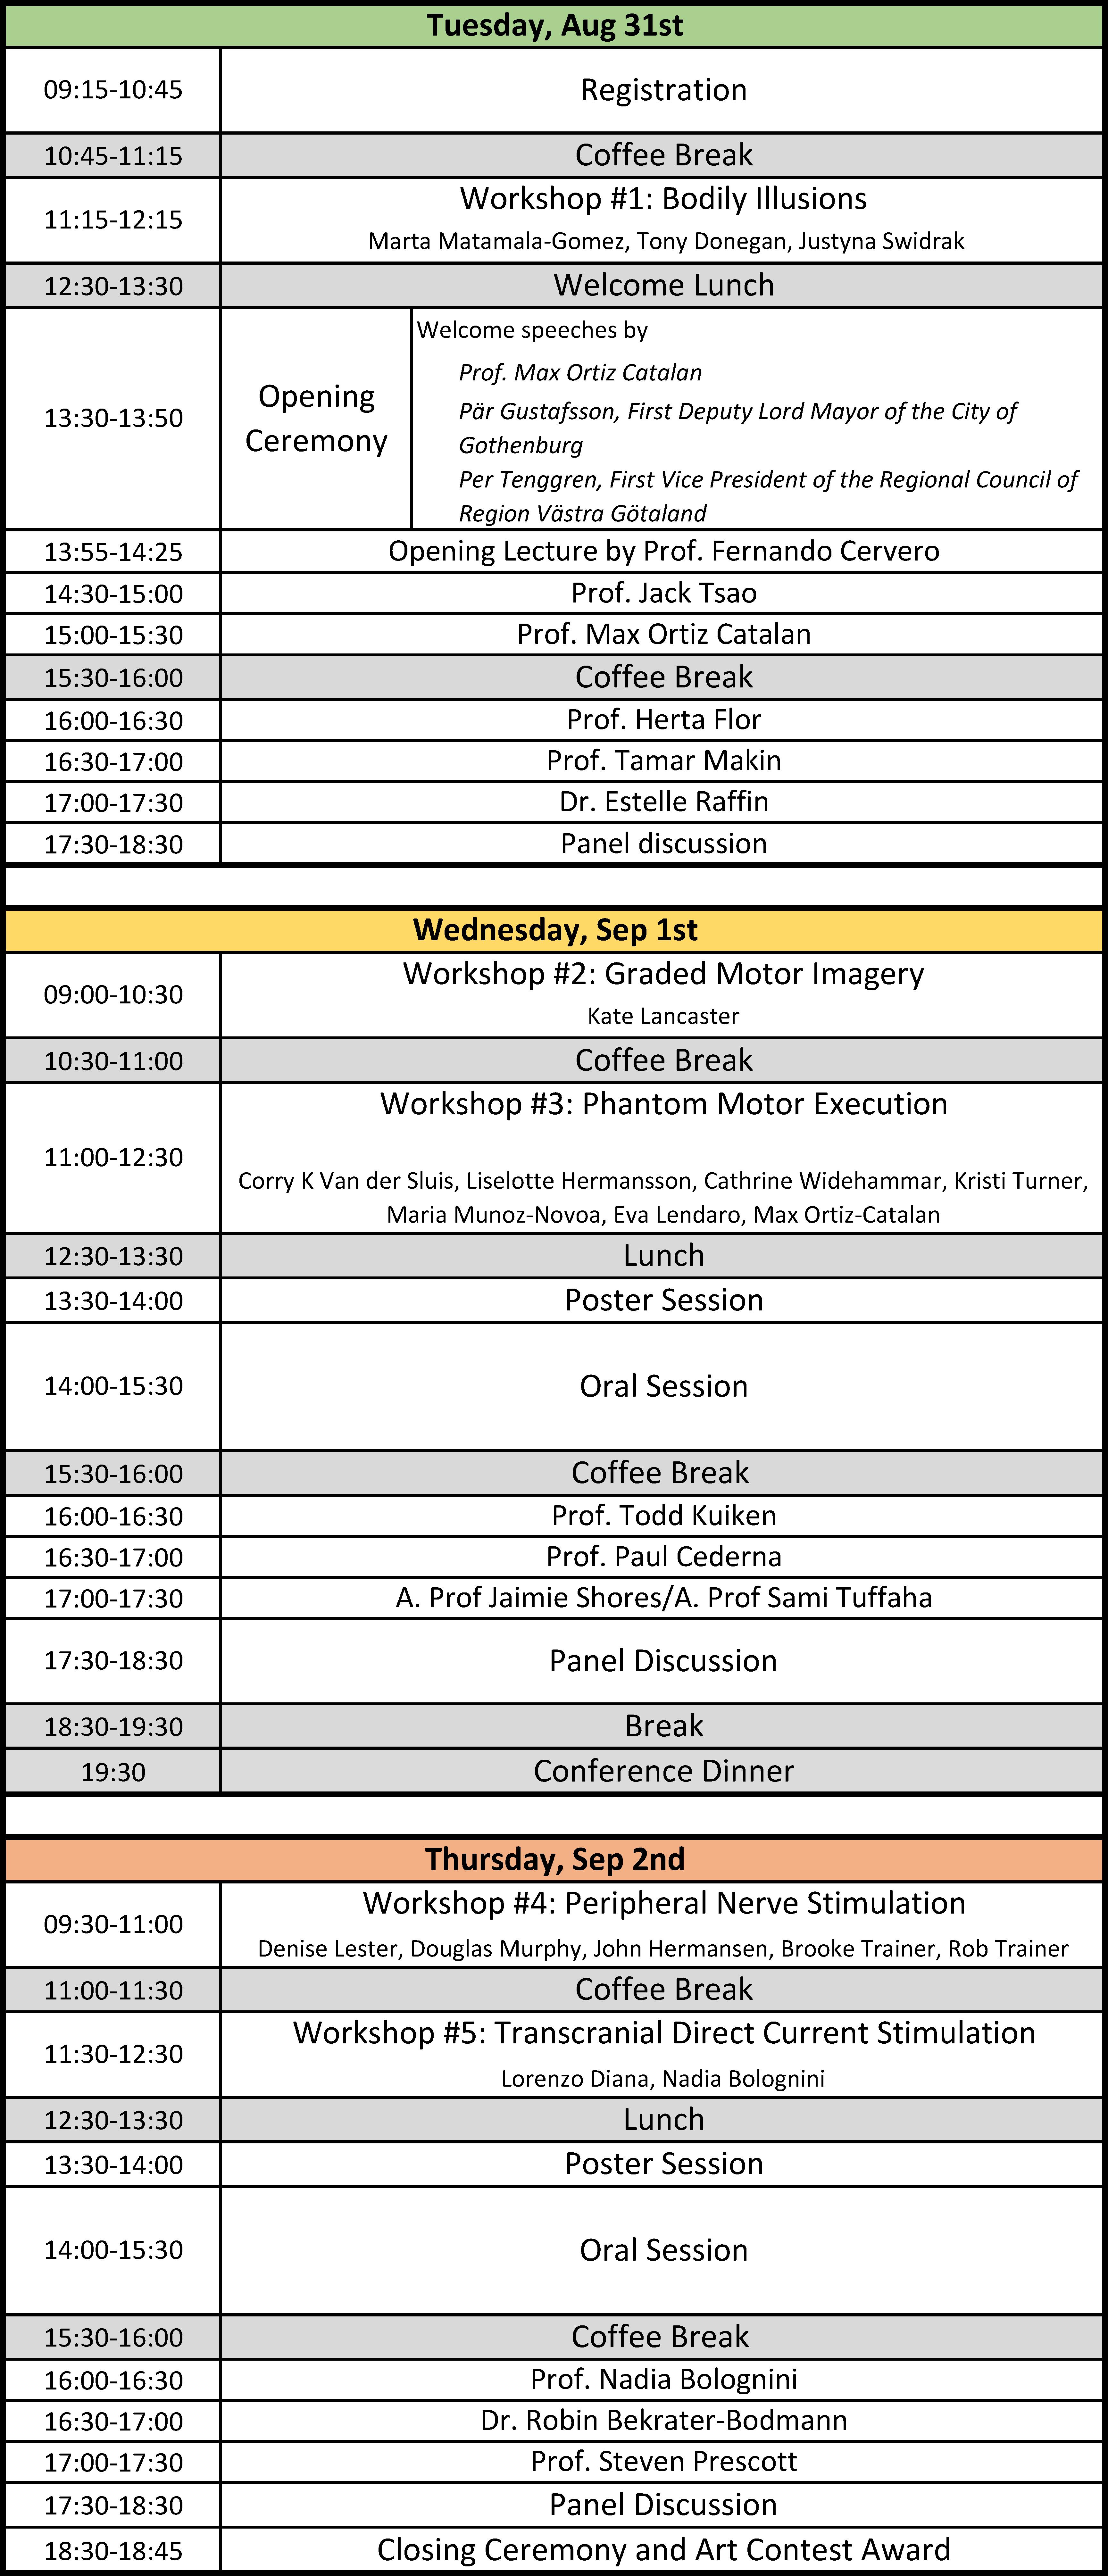 Image of Conference Program.